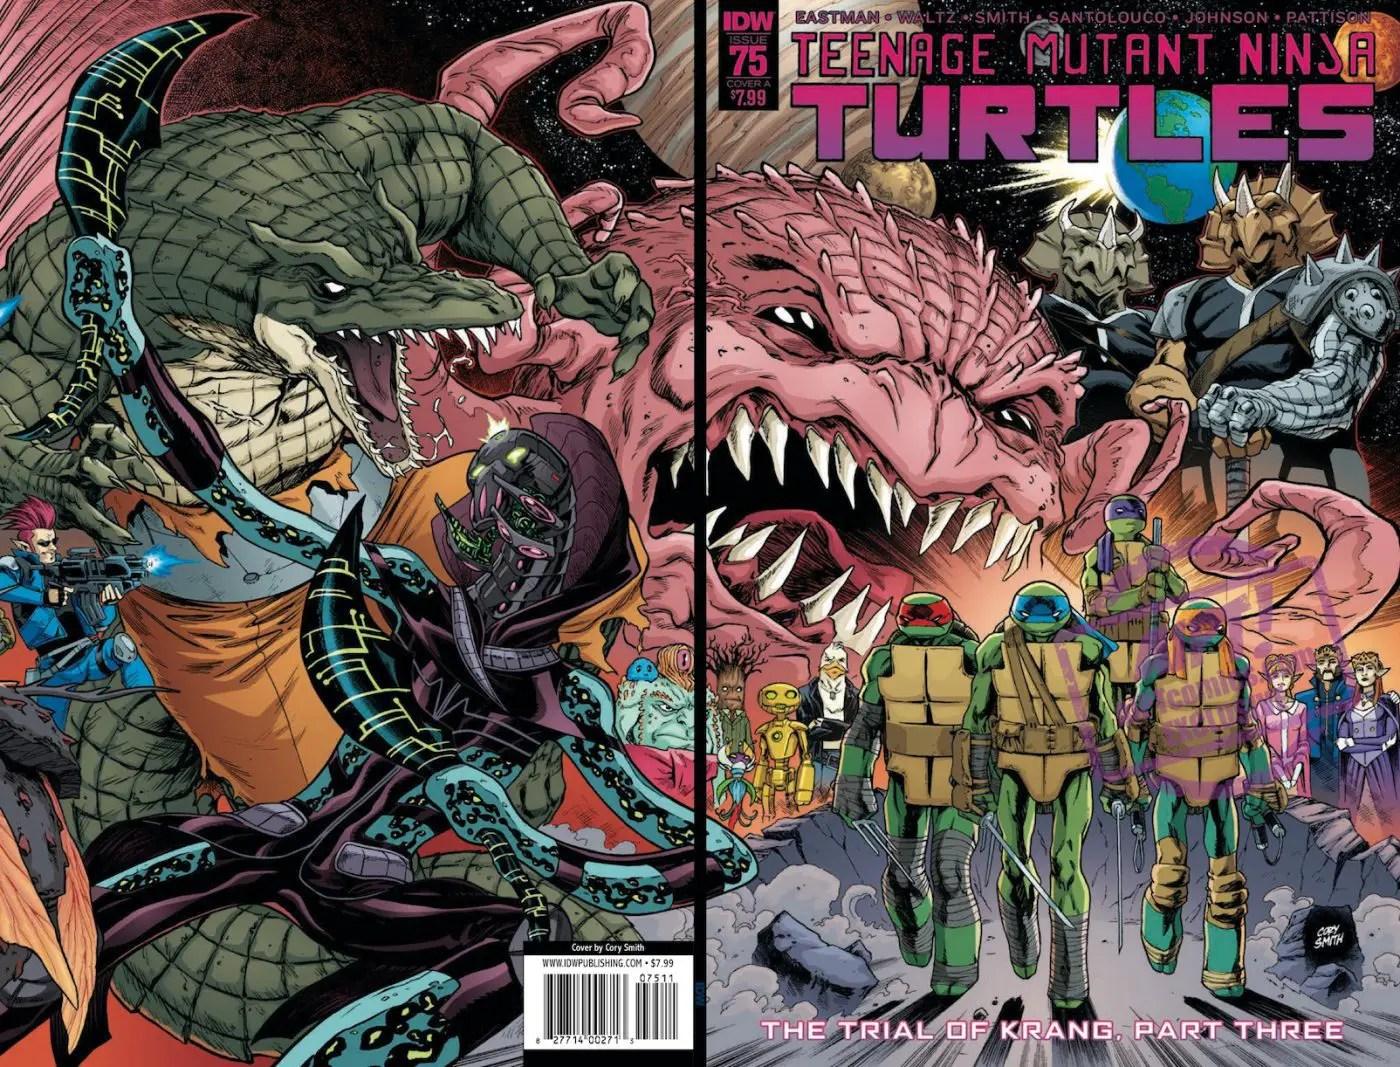 Teenage Mutant Ninja Turtles #75 Review